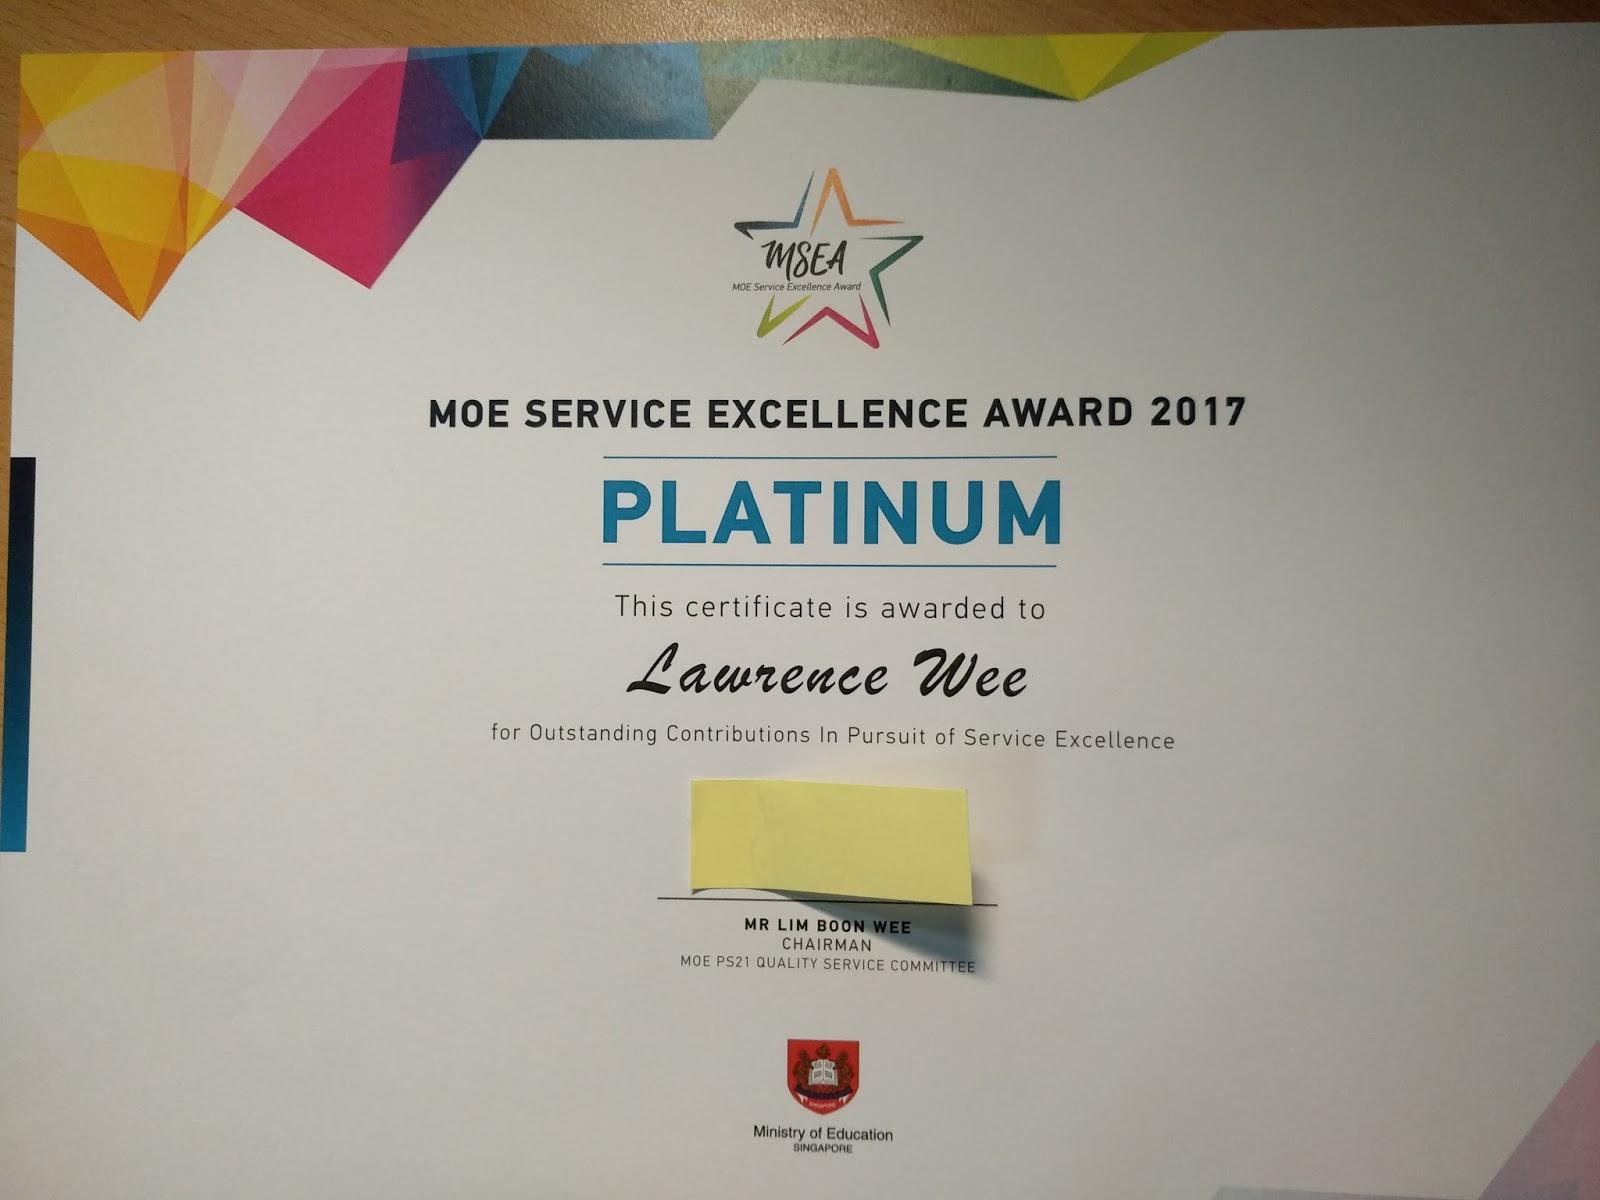 Congratulations to all MOE Service Excellence Award (MSEA) 2017